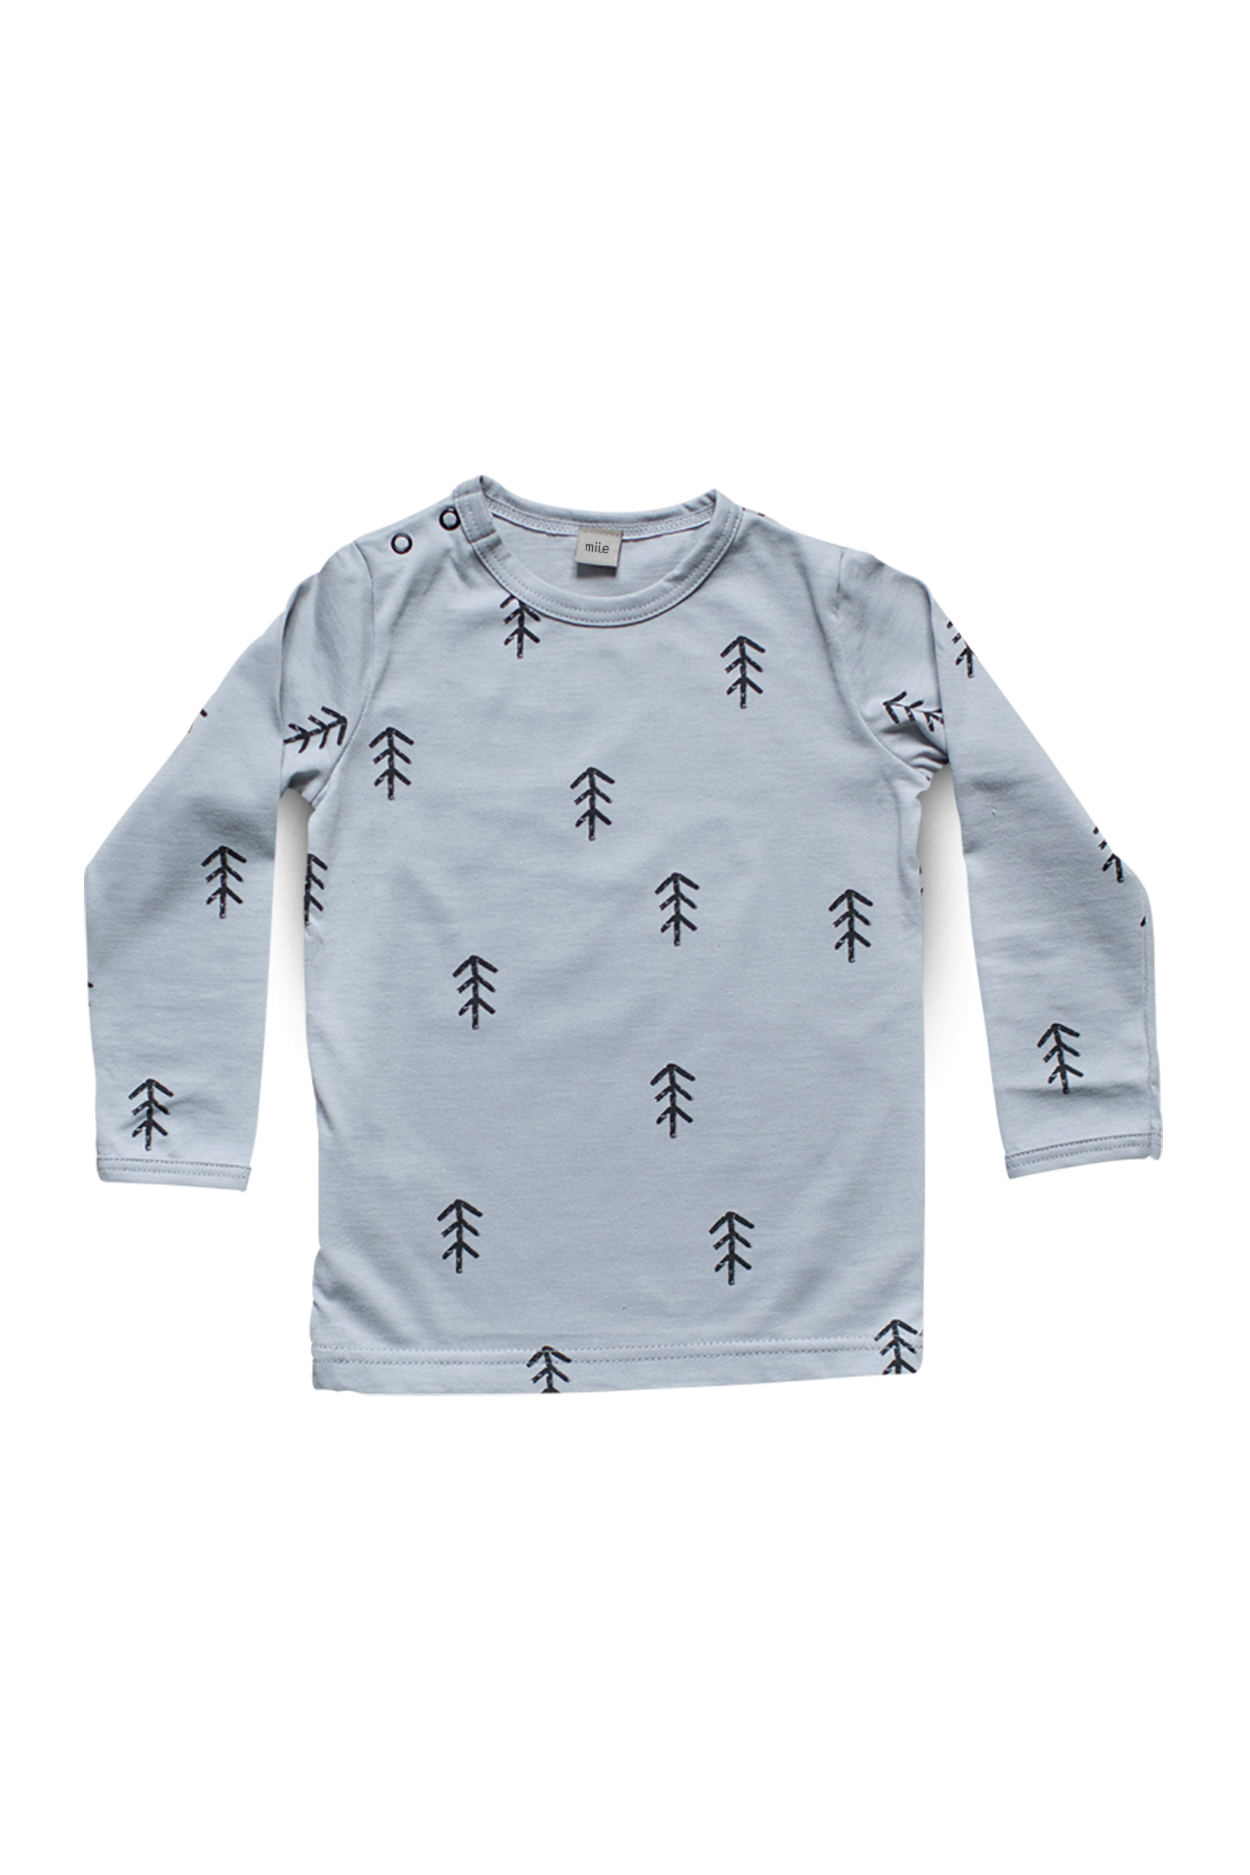 little trees t-shirts long sleeve